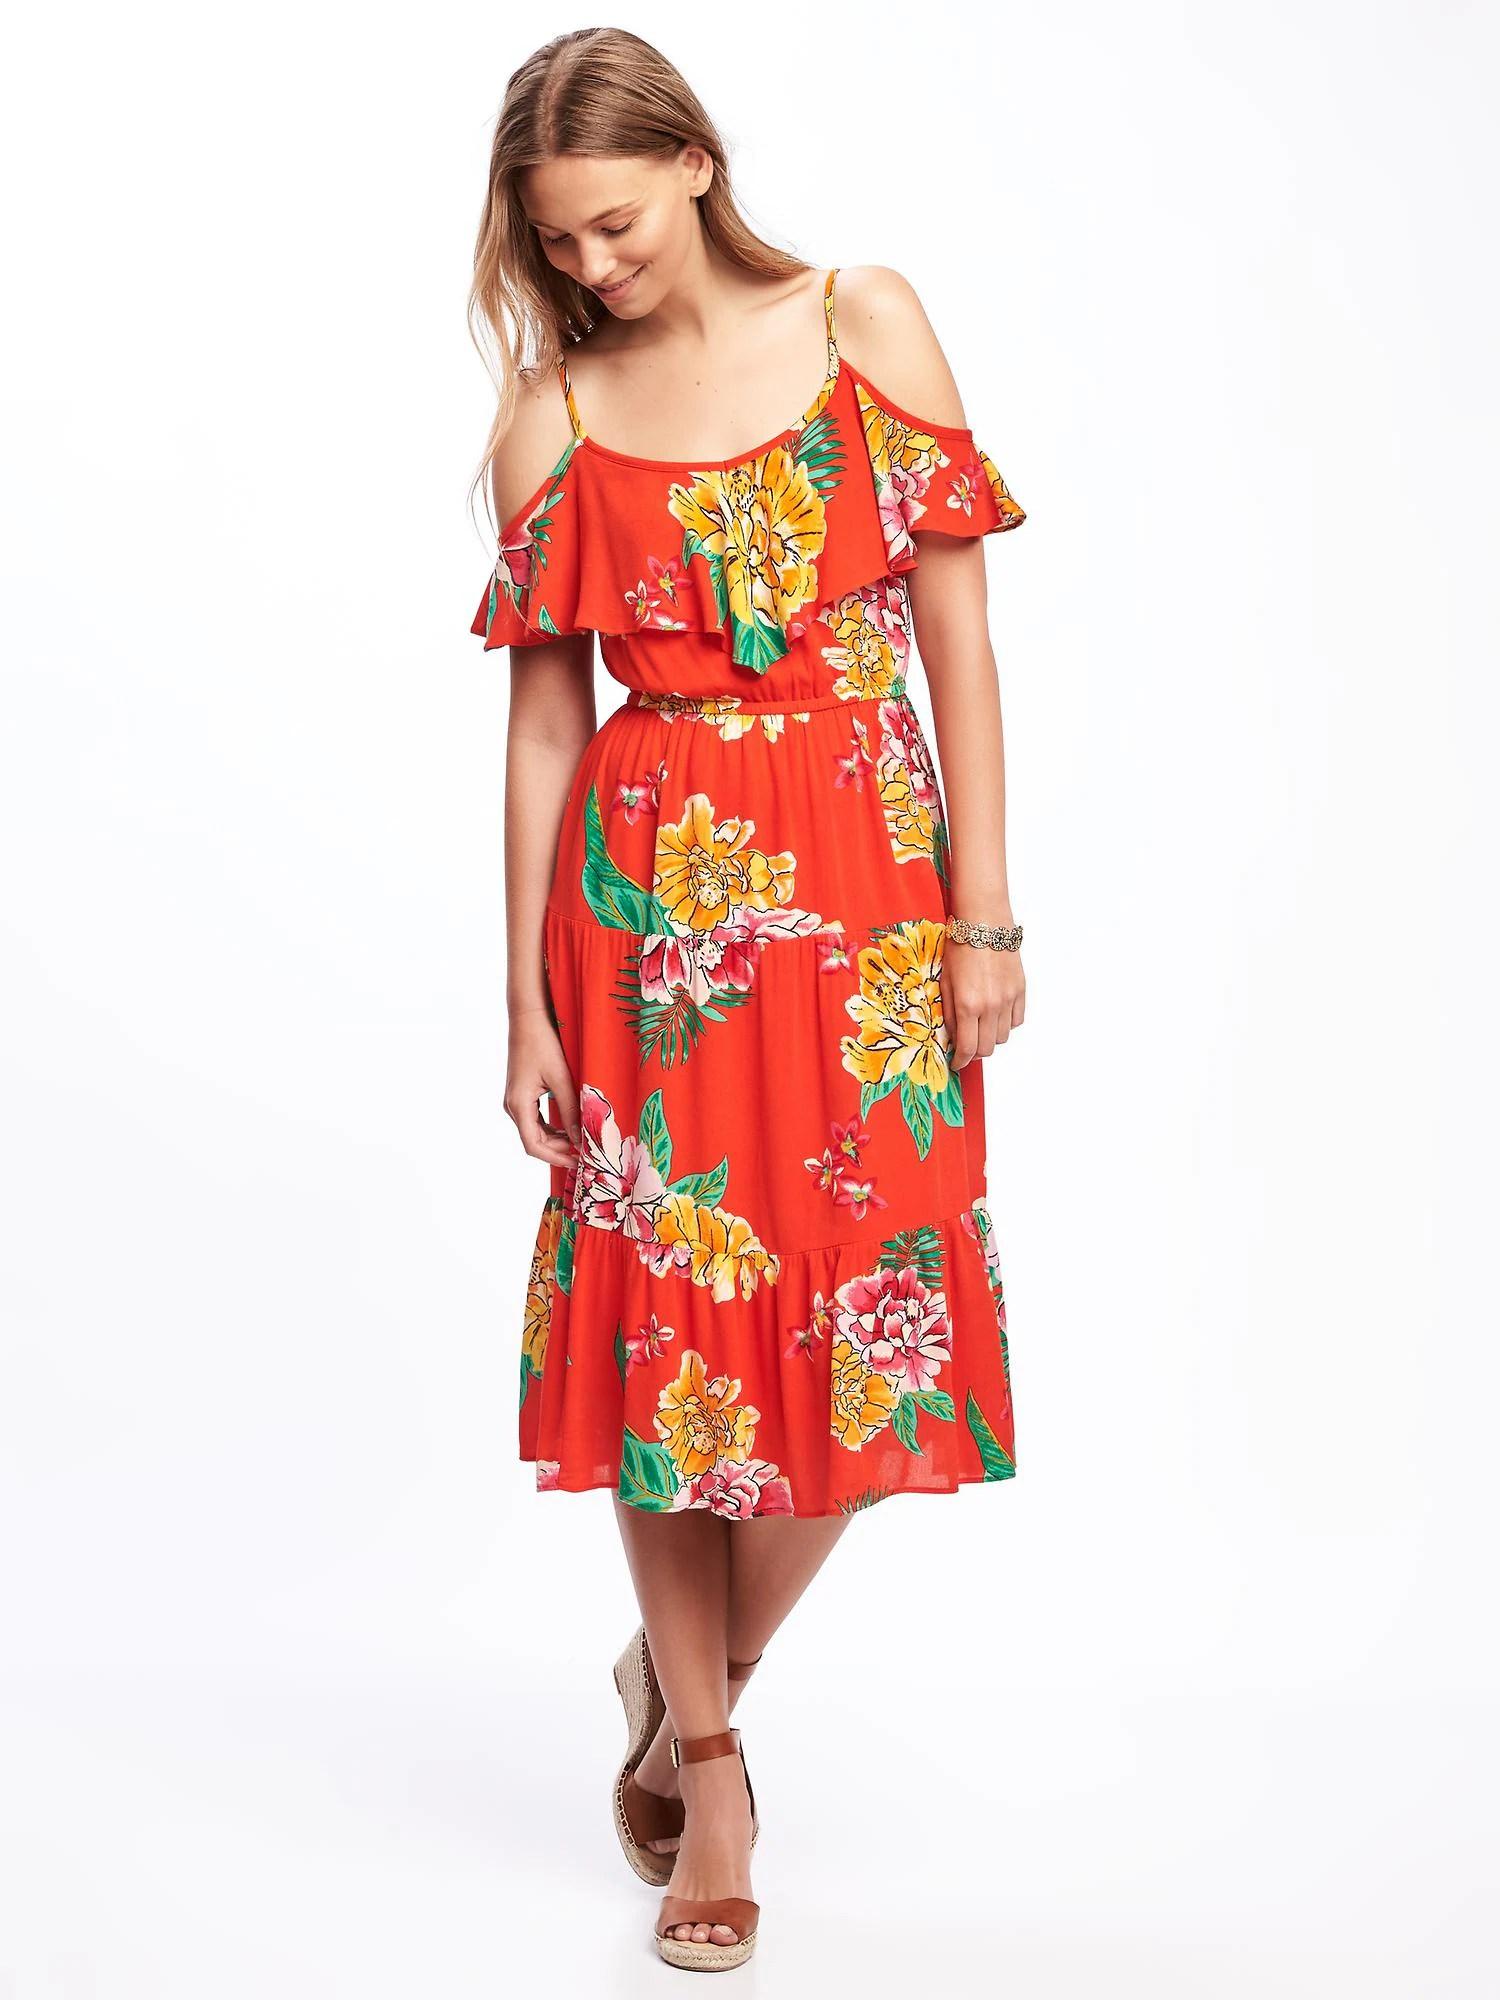 5aa220abe955 Crochet-Trim Swing Dress (in Creme De La Creme)